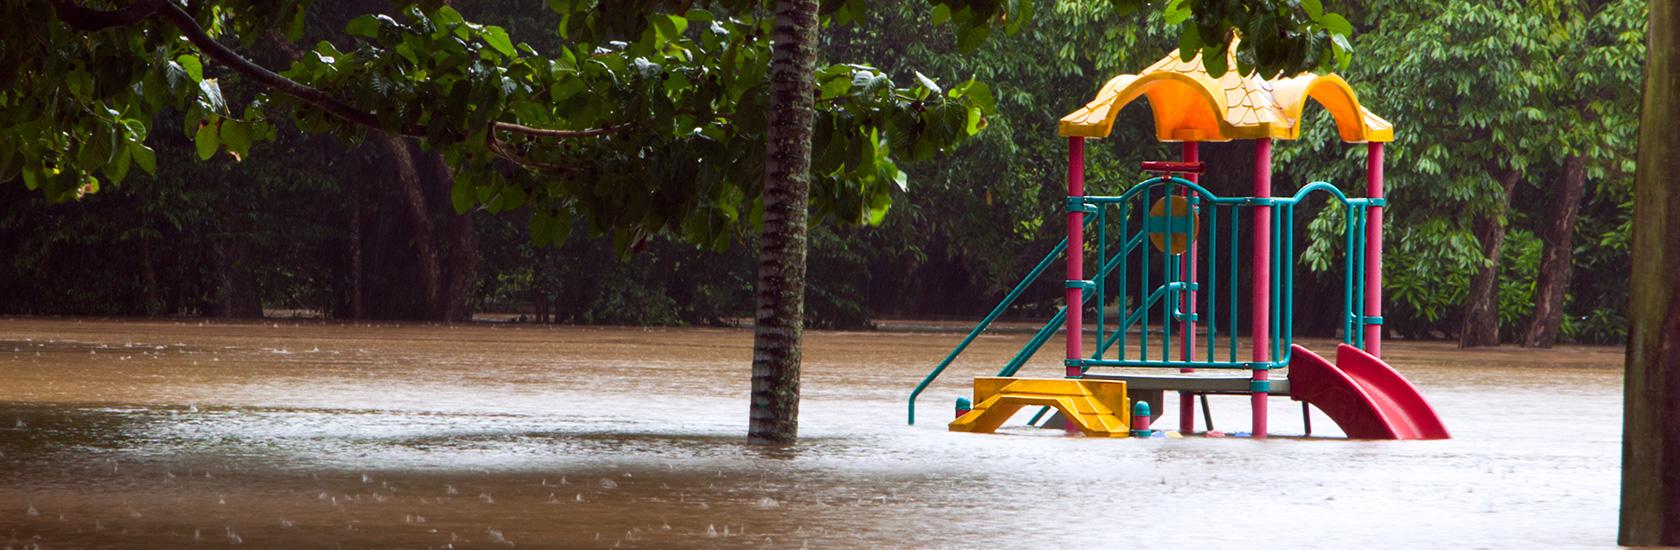 Flood Insurance in Florida